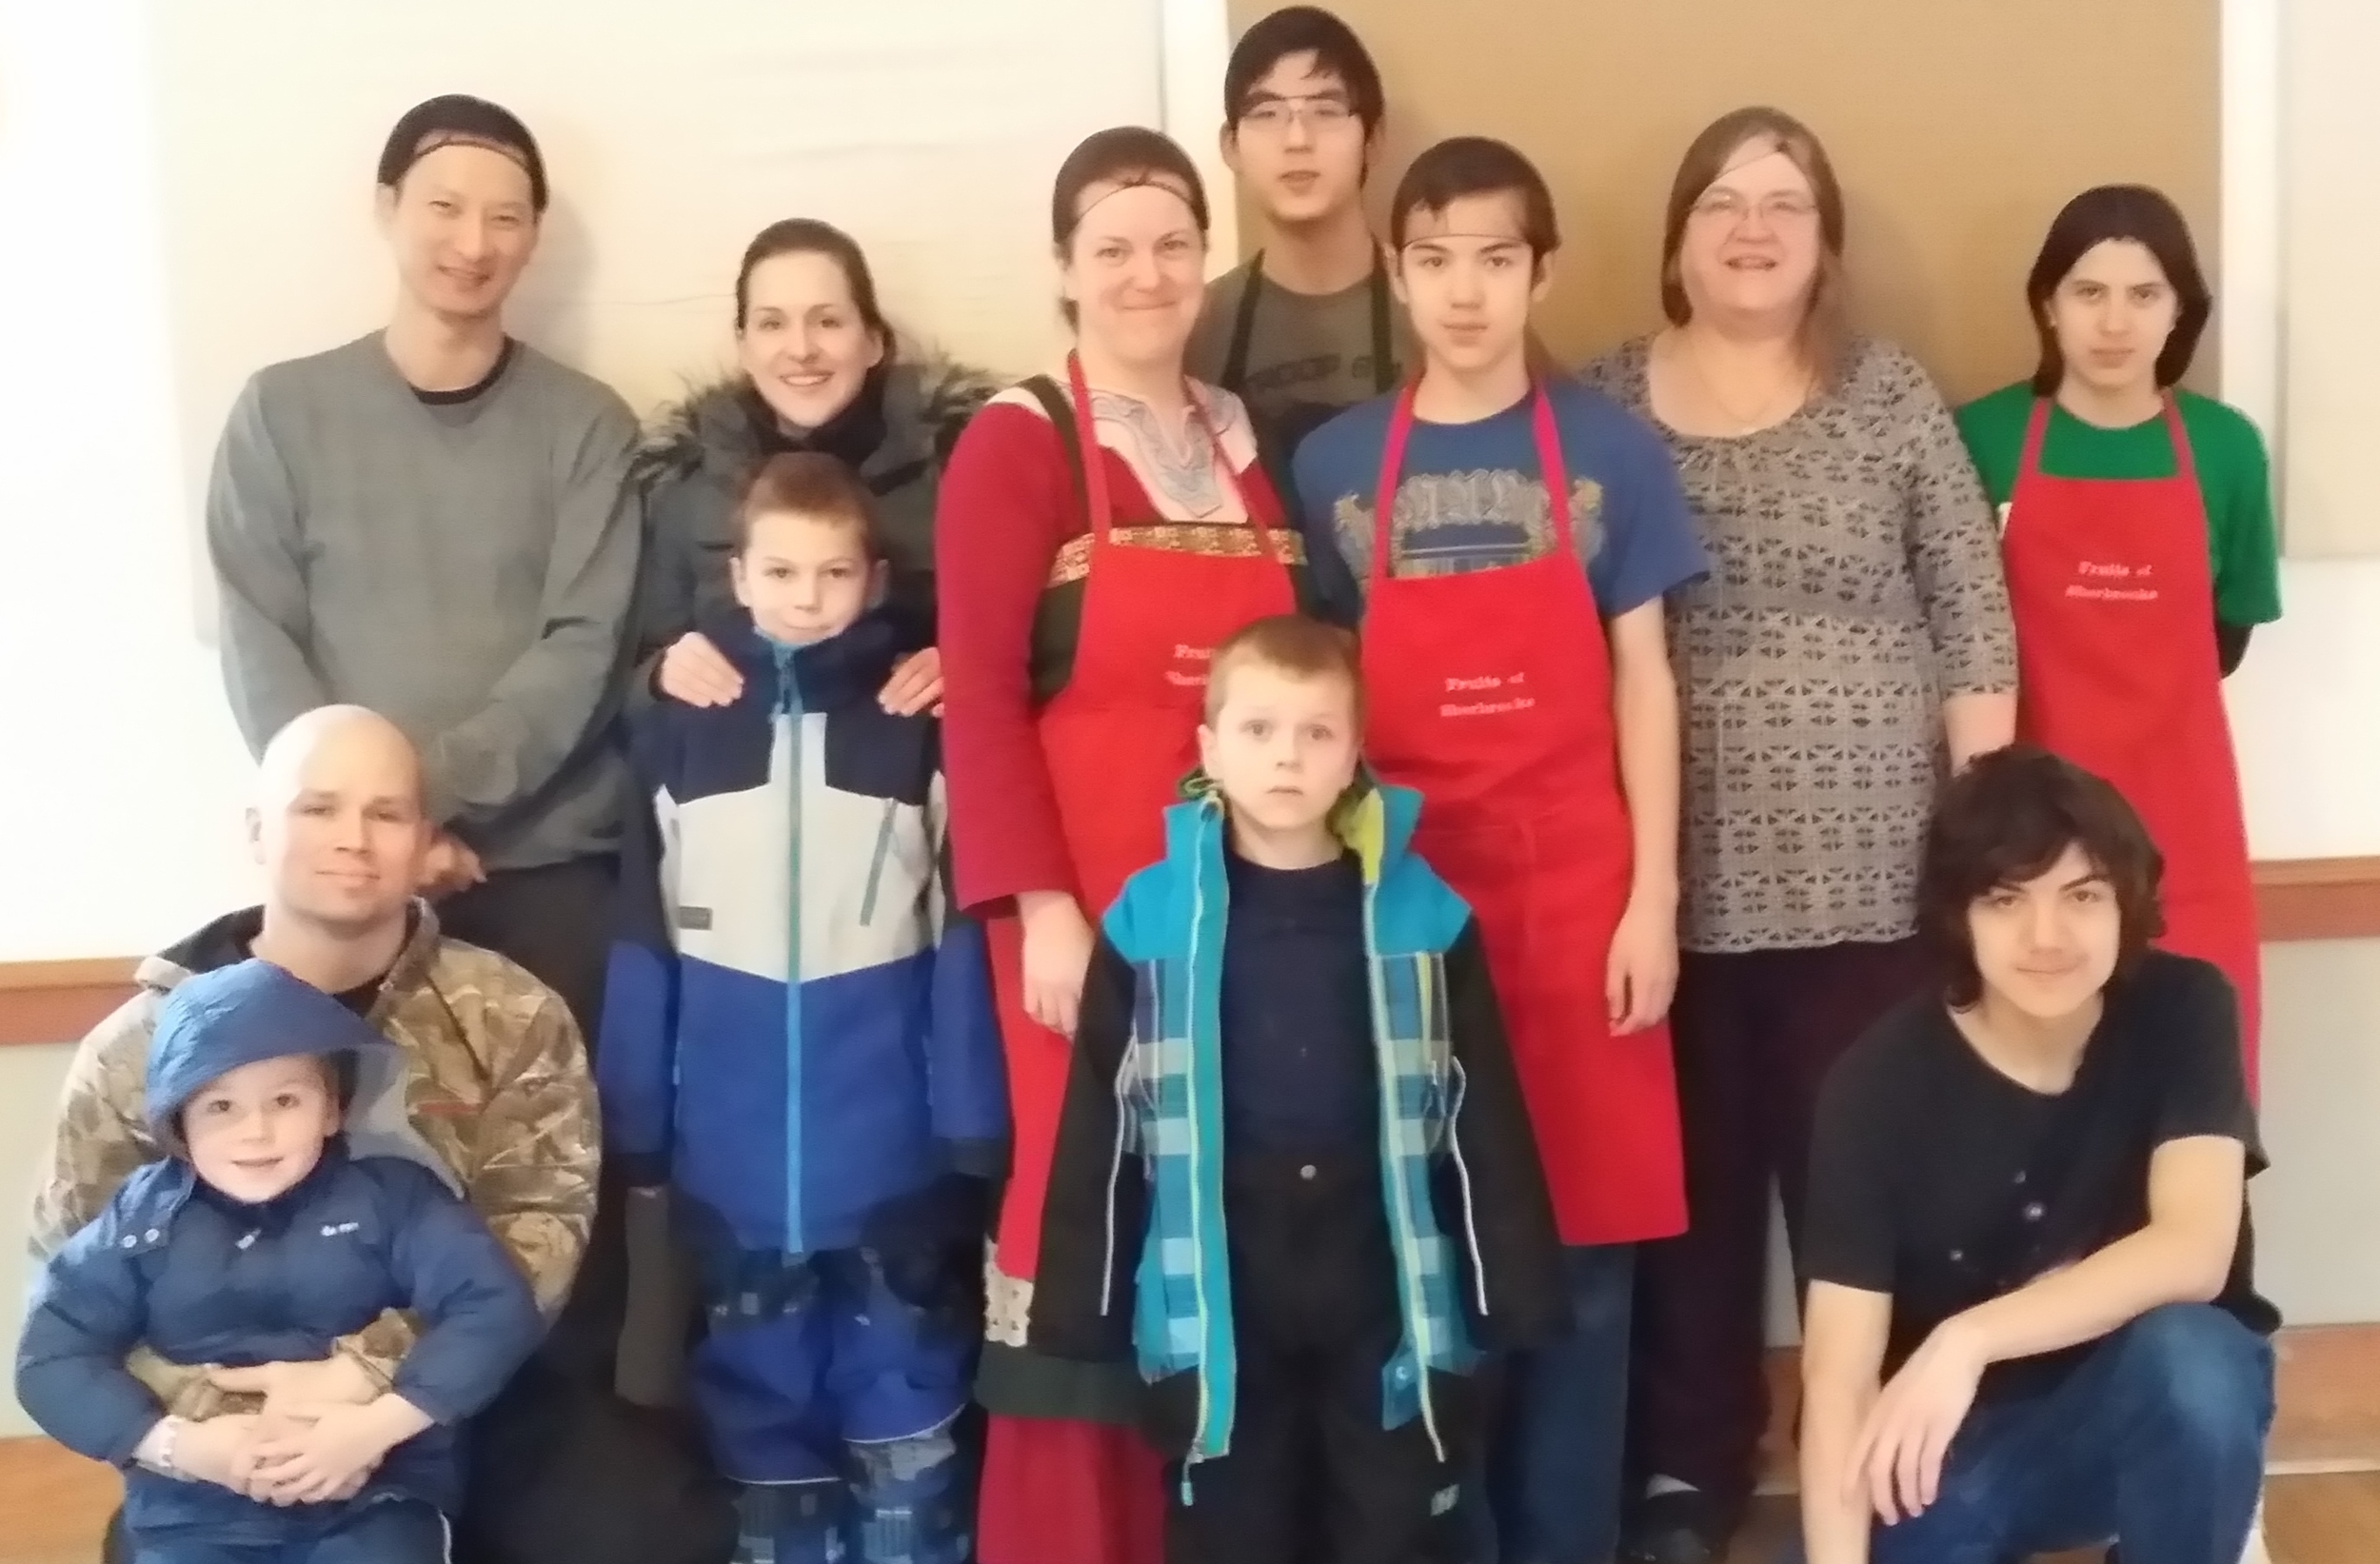 Gramma Linda's group